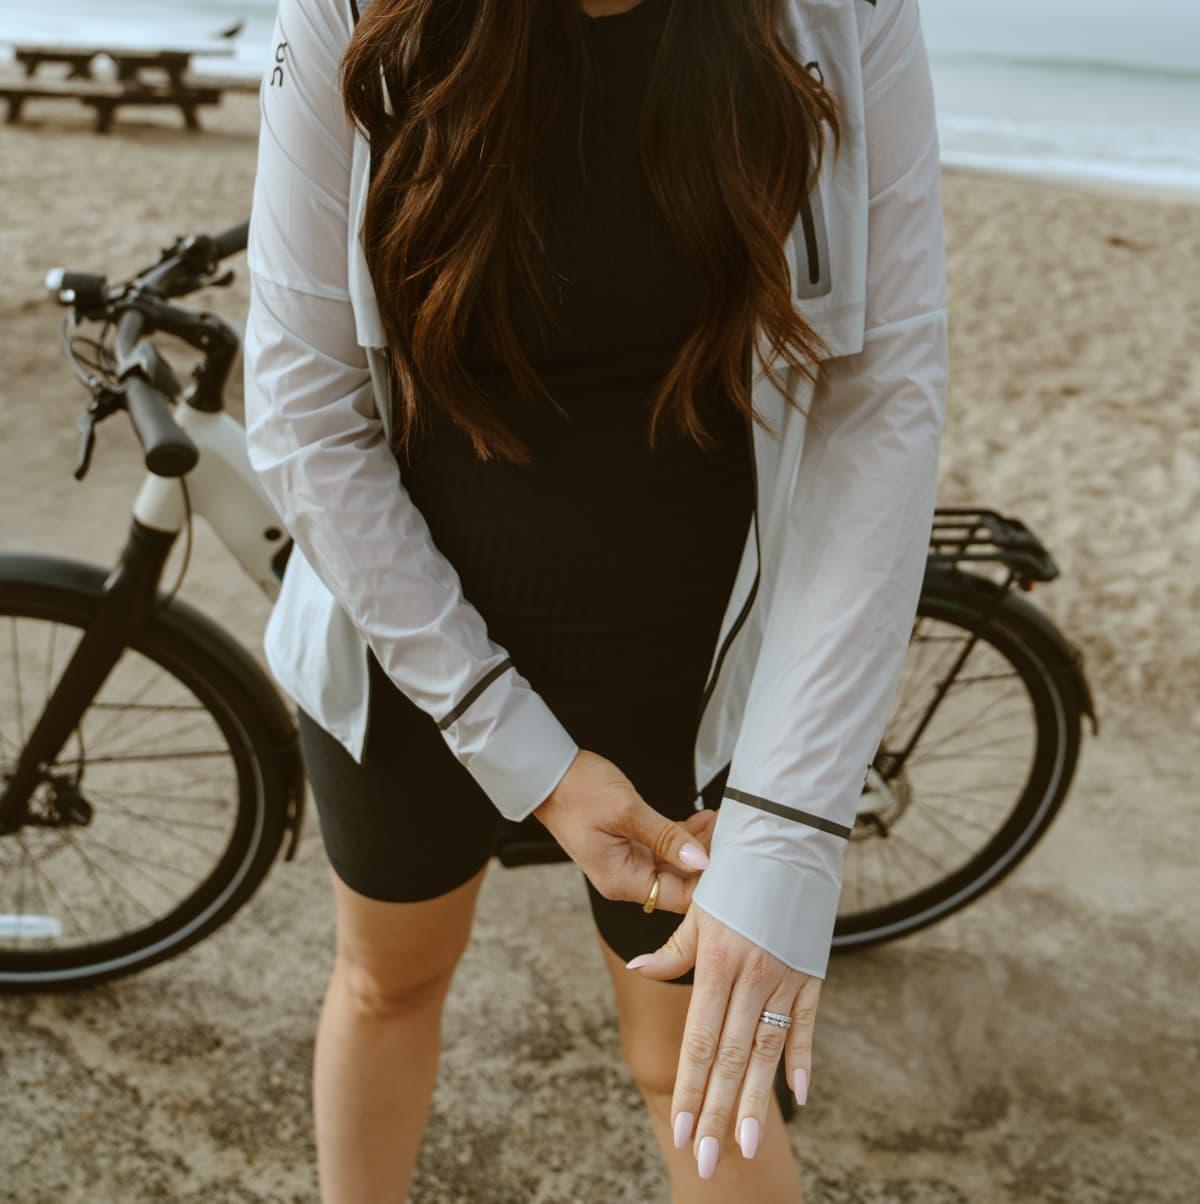 jacket for bike rides